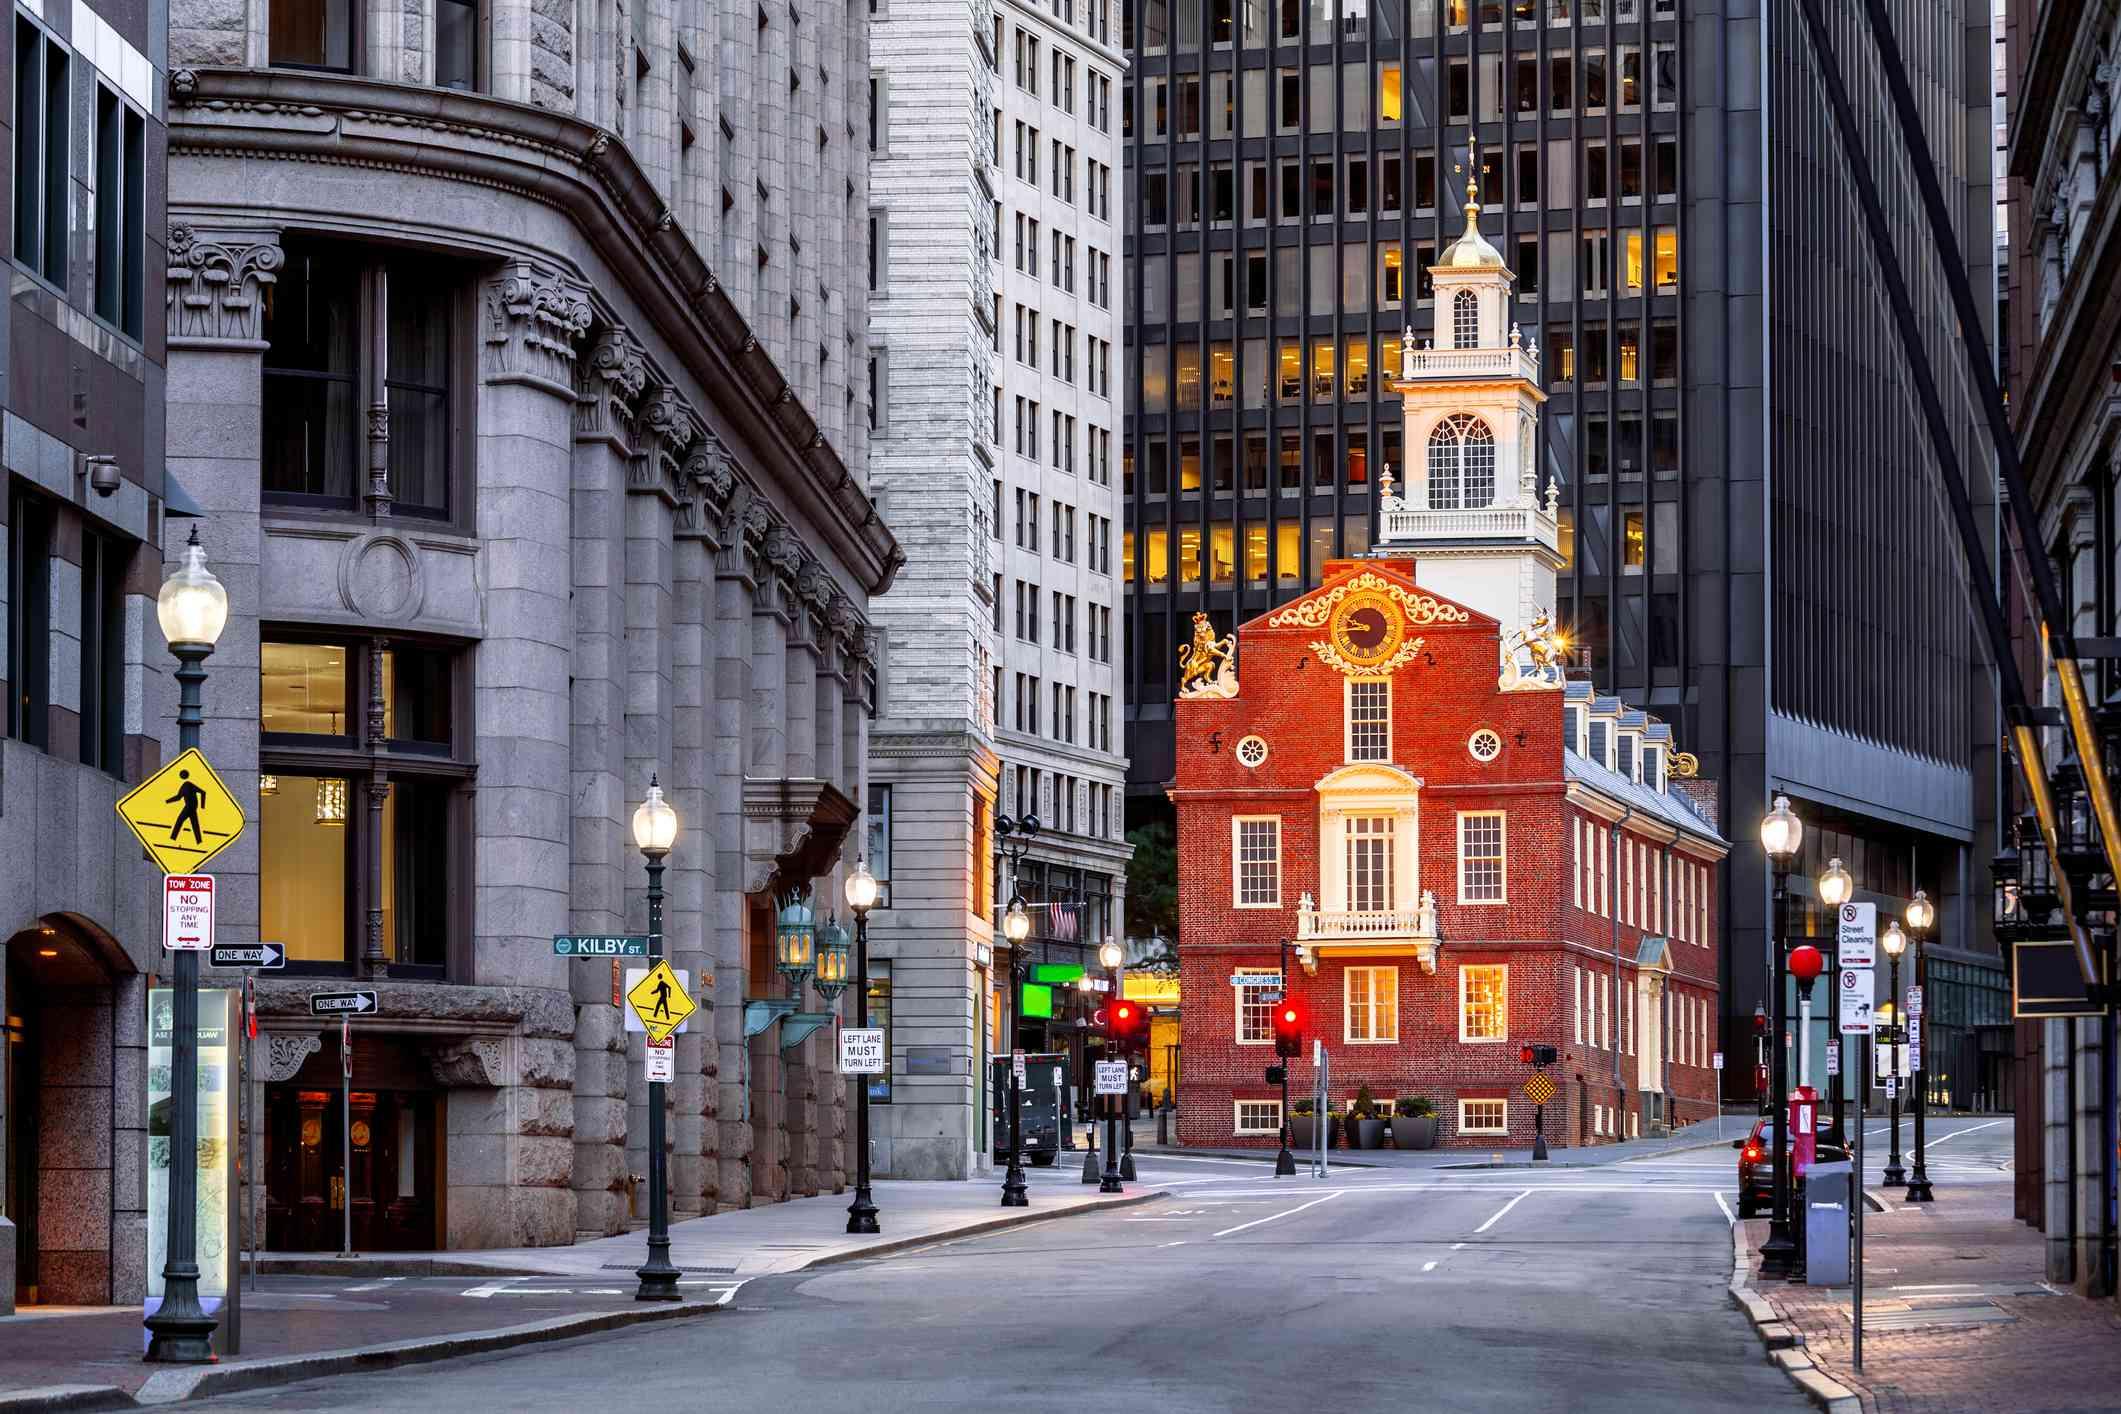 Old State House, Boston, Massachusetts, America